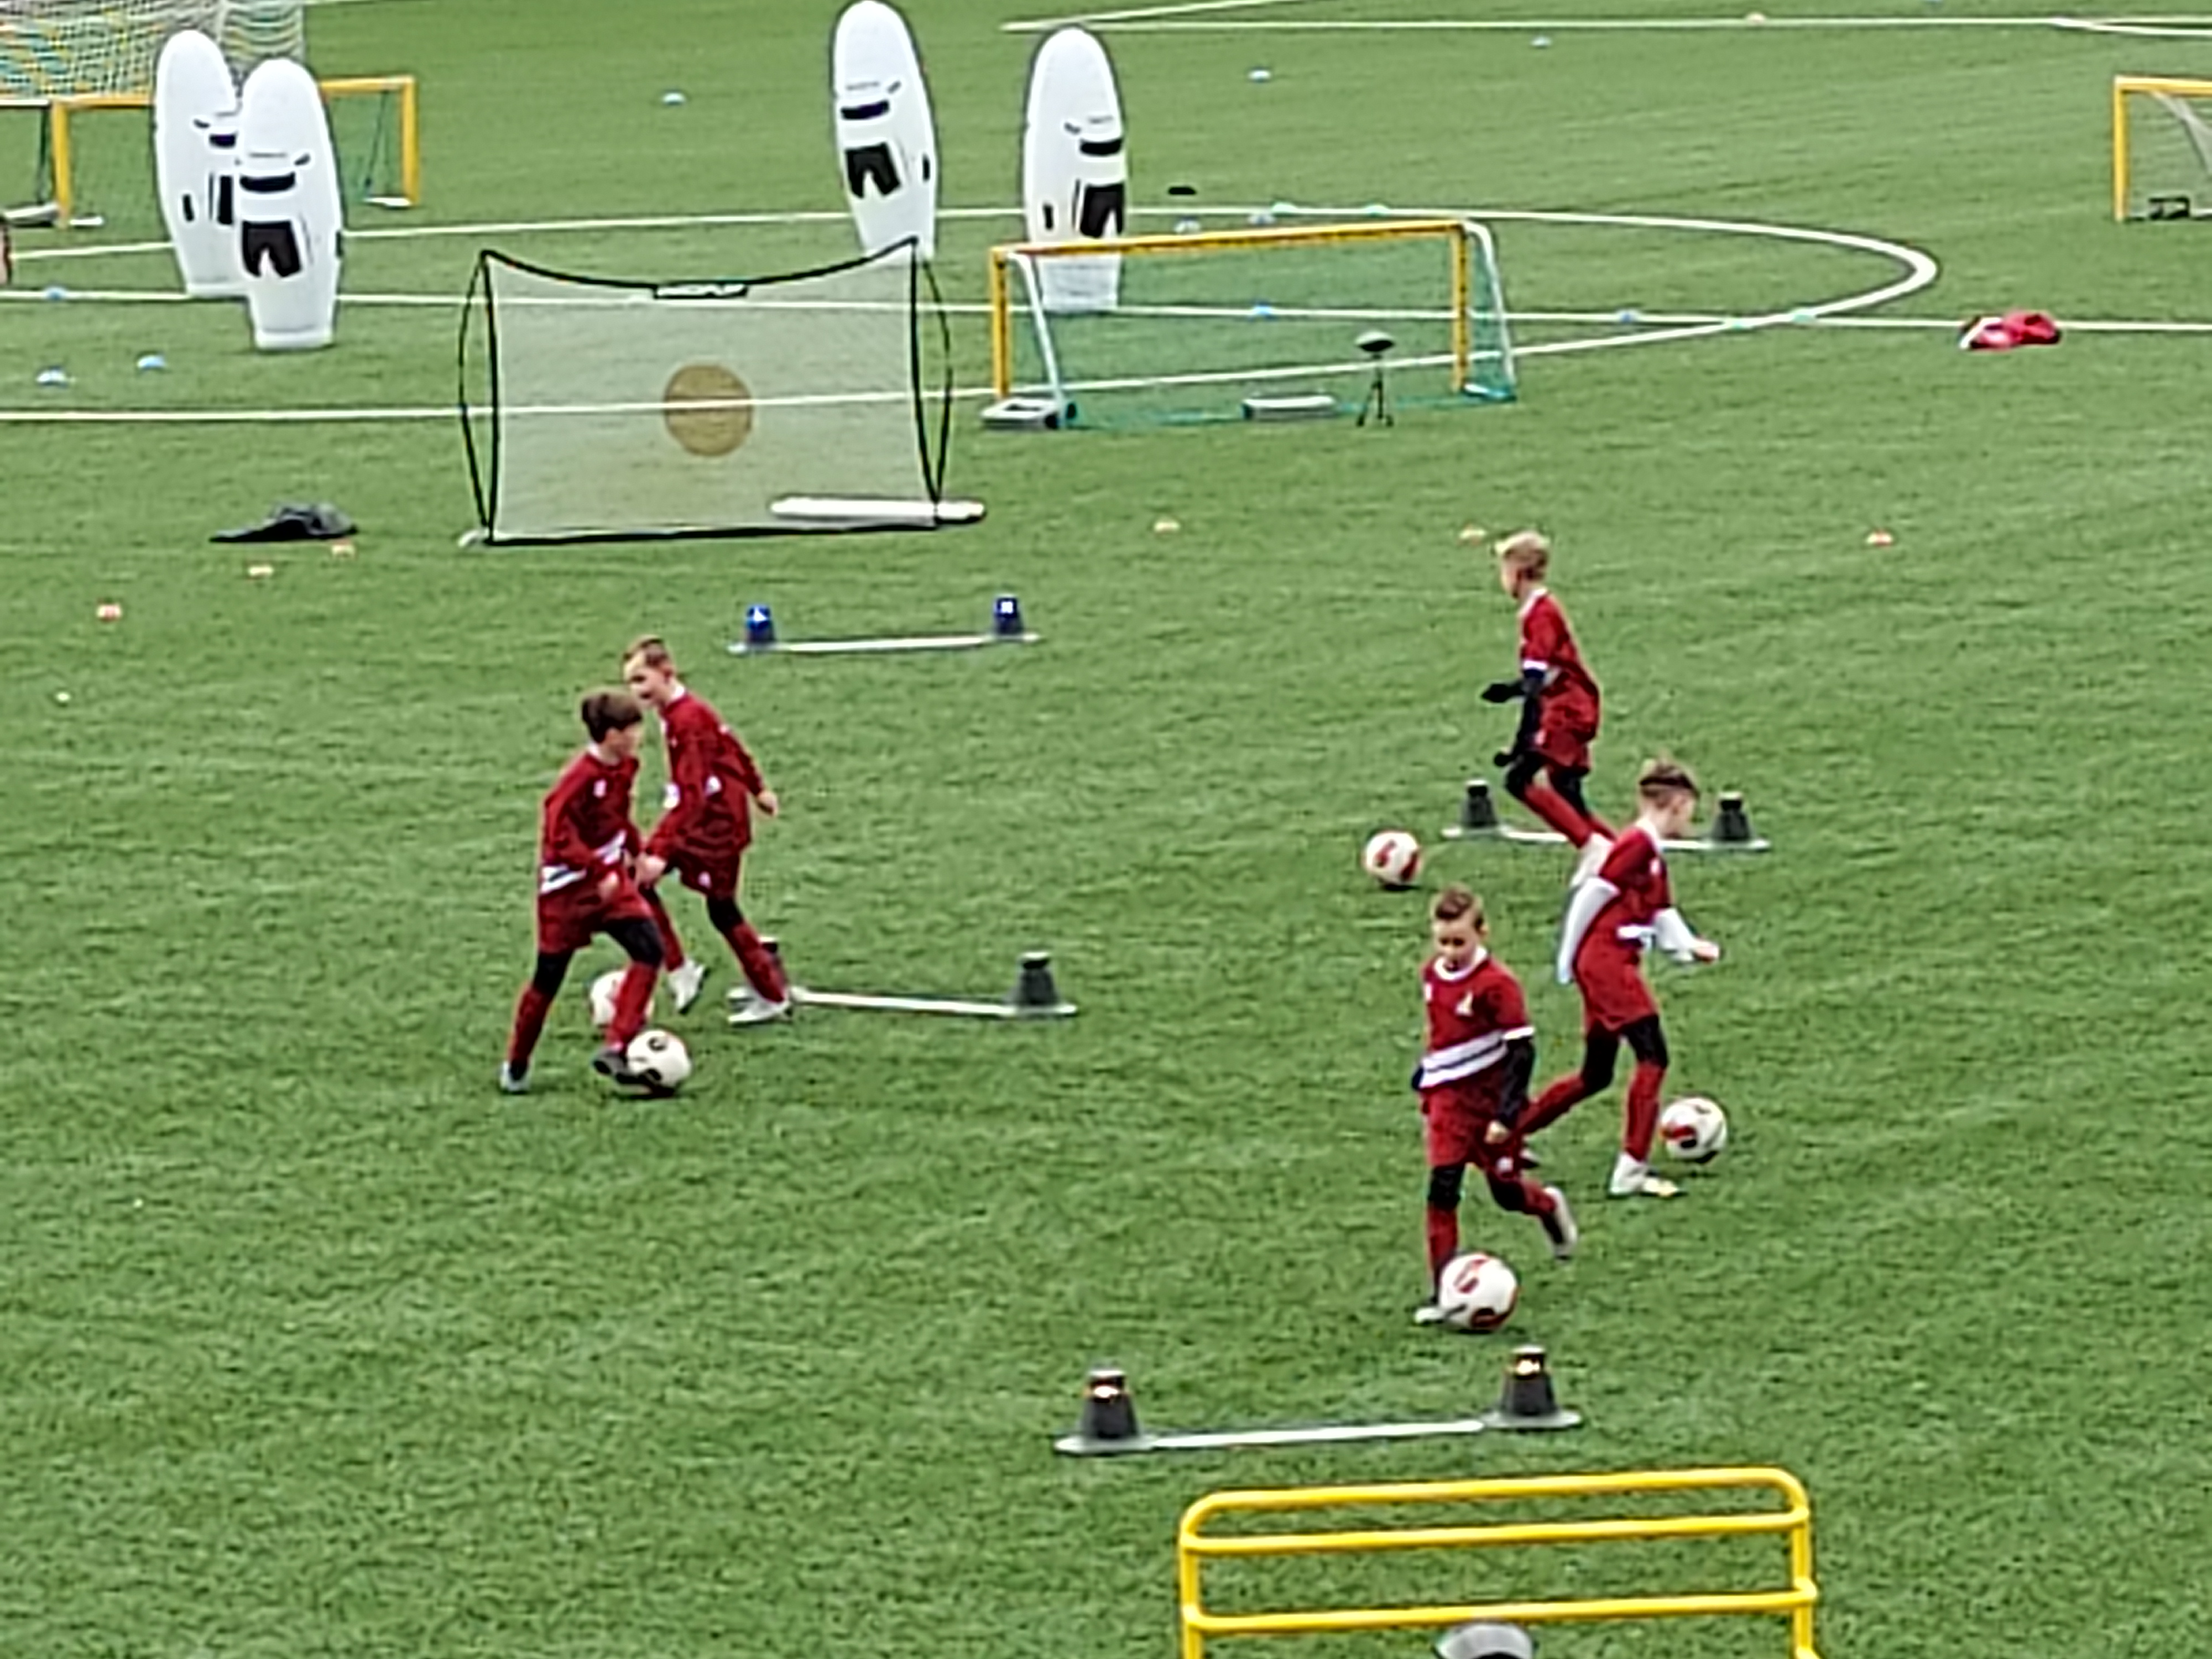 Training DOVO